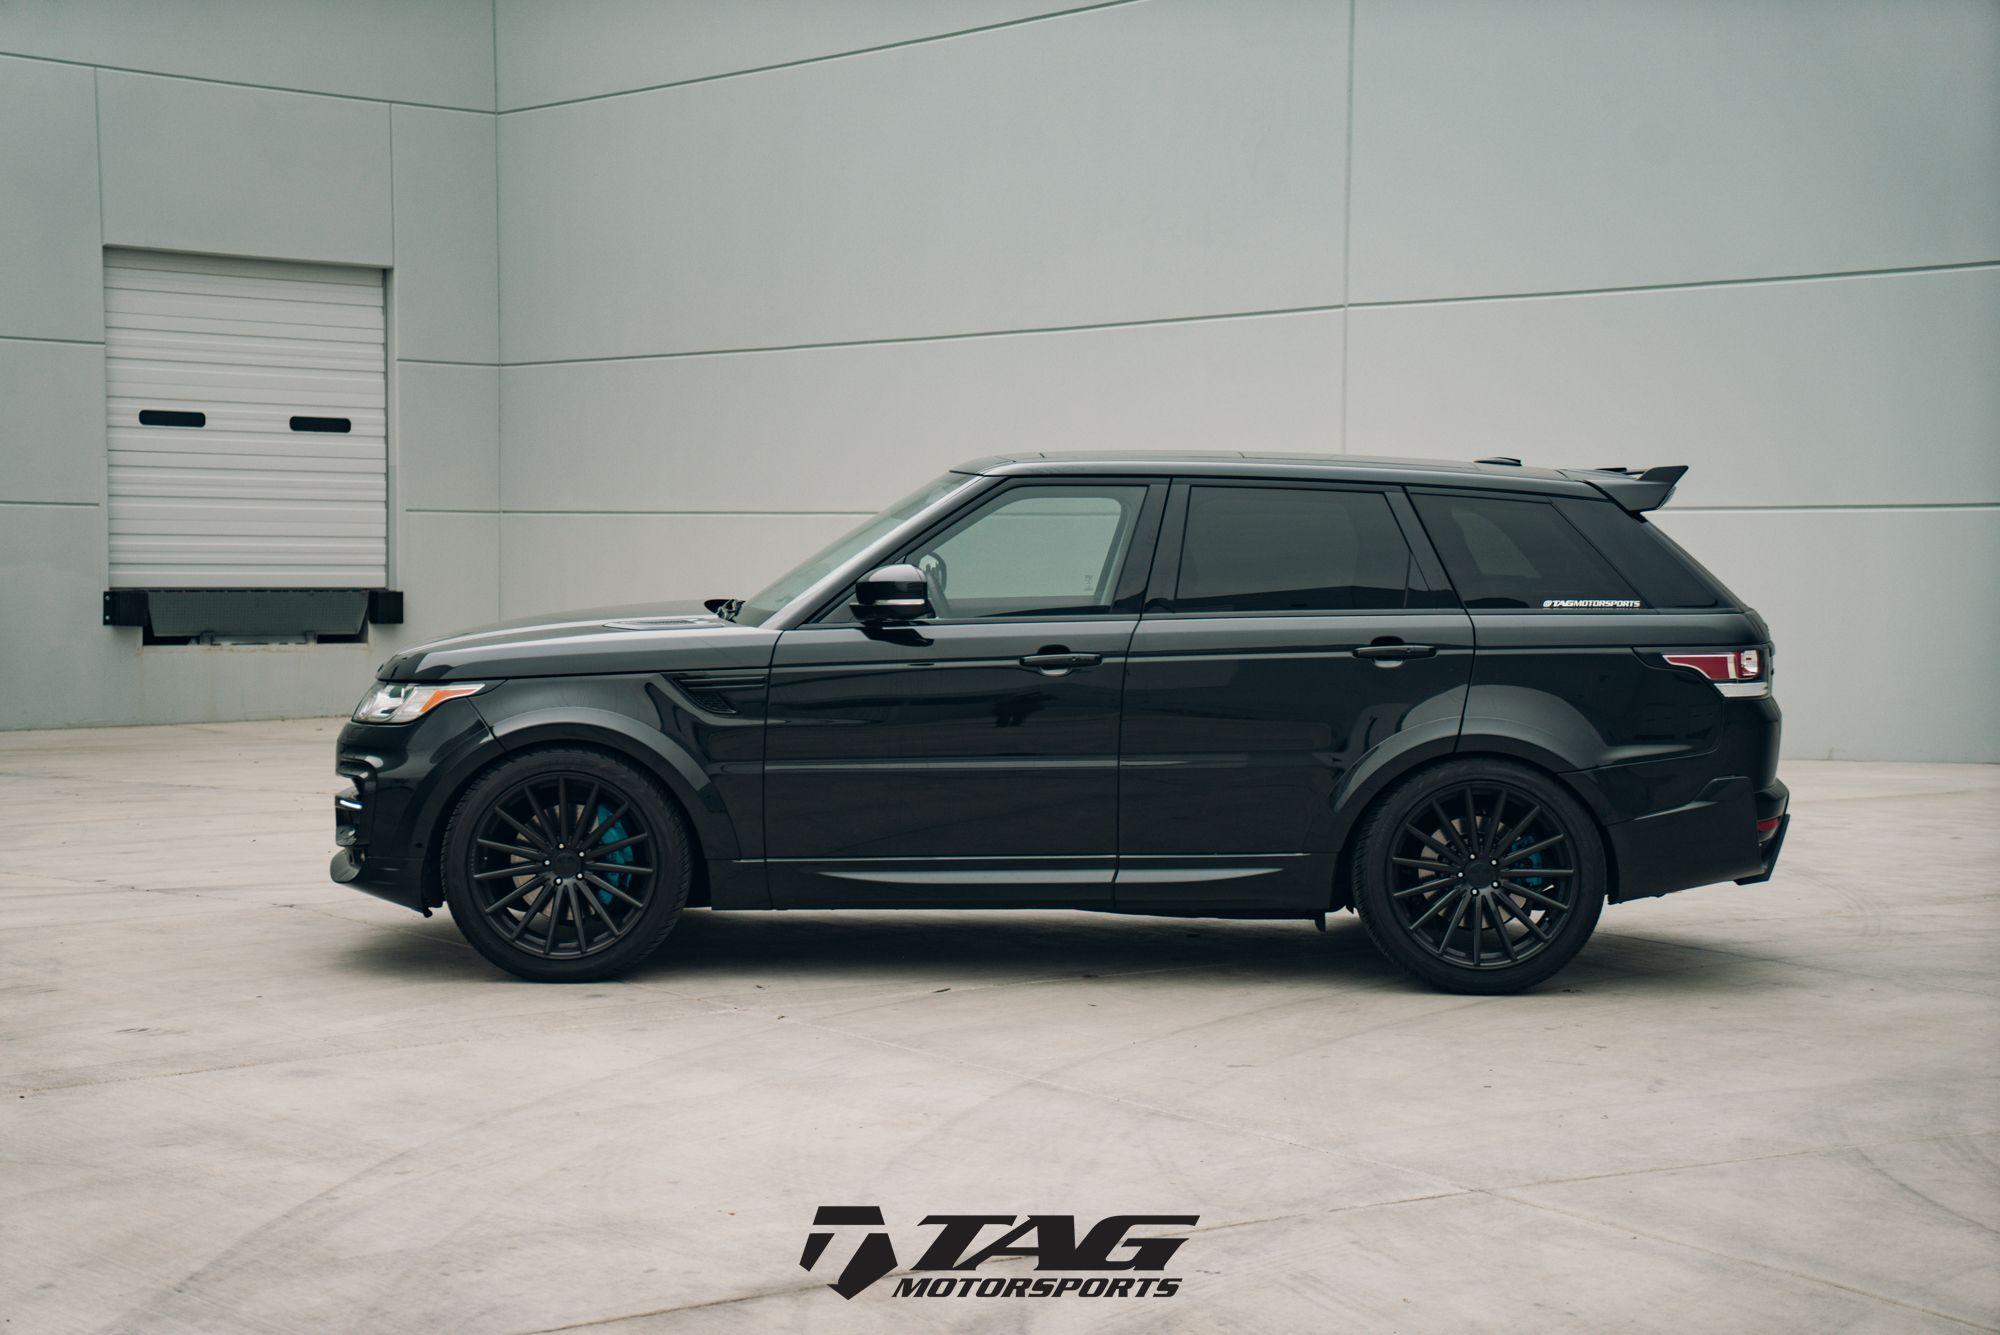 TAG Motorsports Cars For Sale 2015 Range Rover Sport